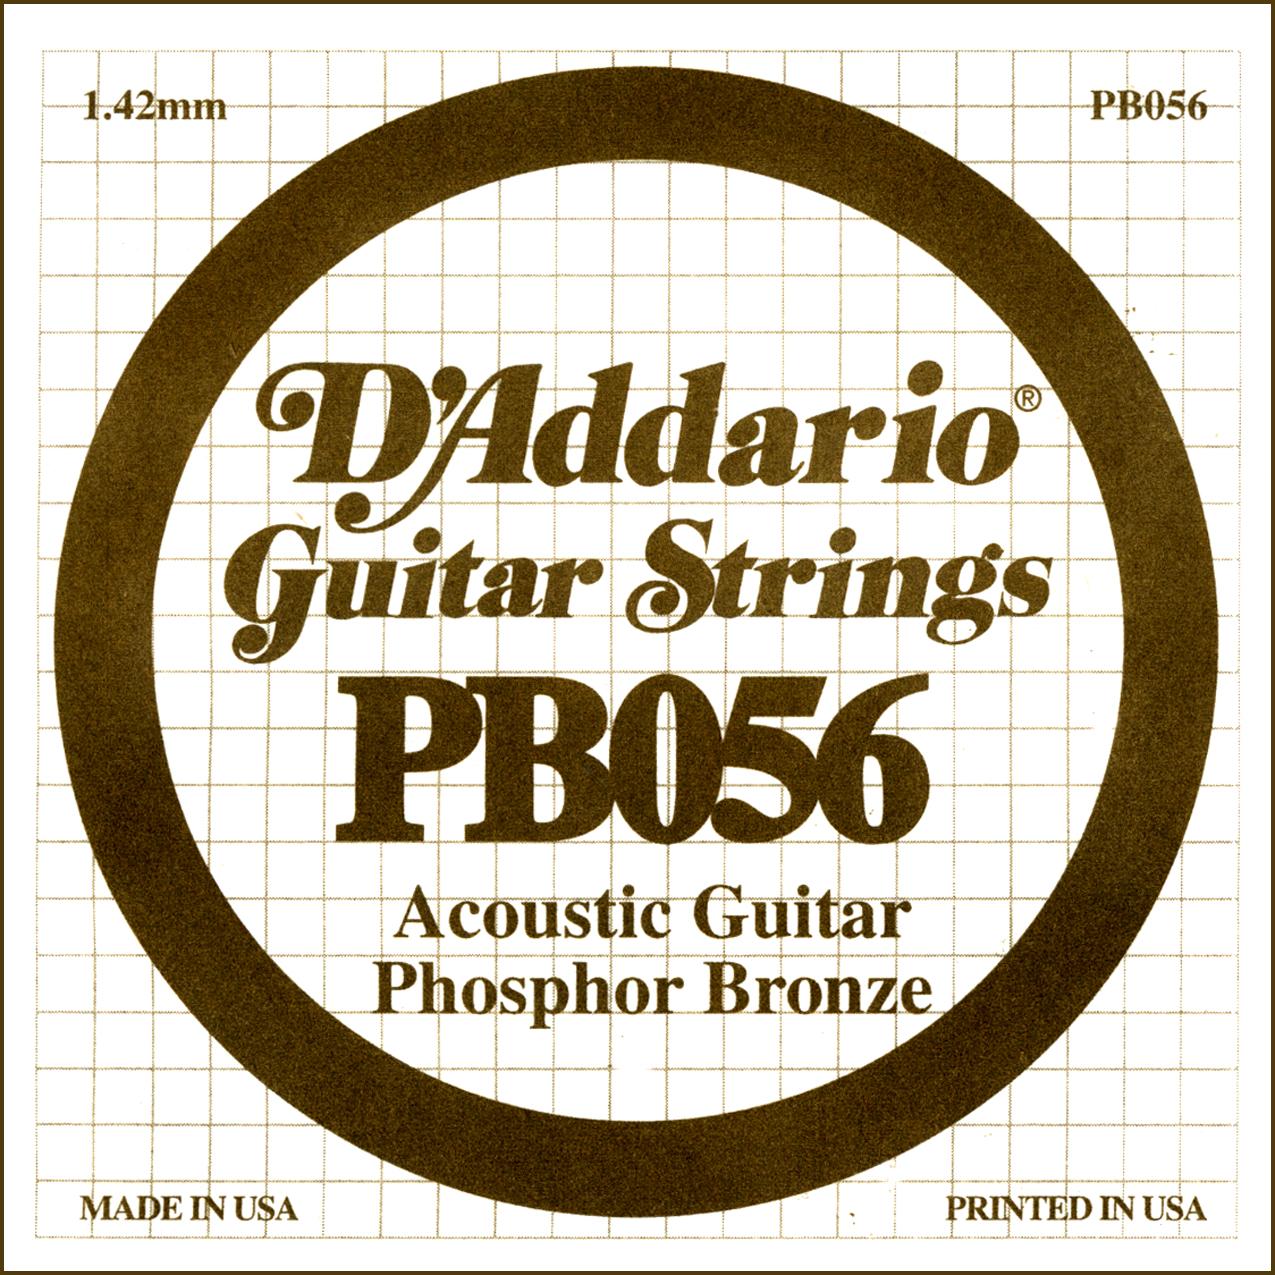 D'Addario Single Strings PBO56